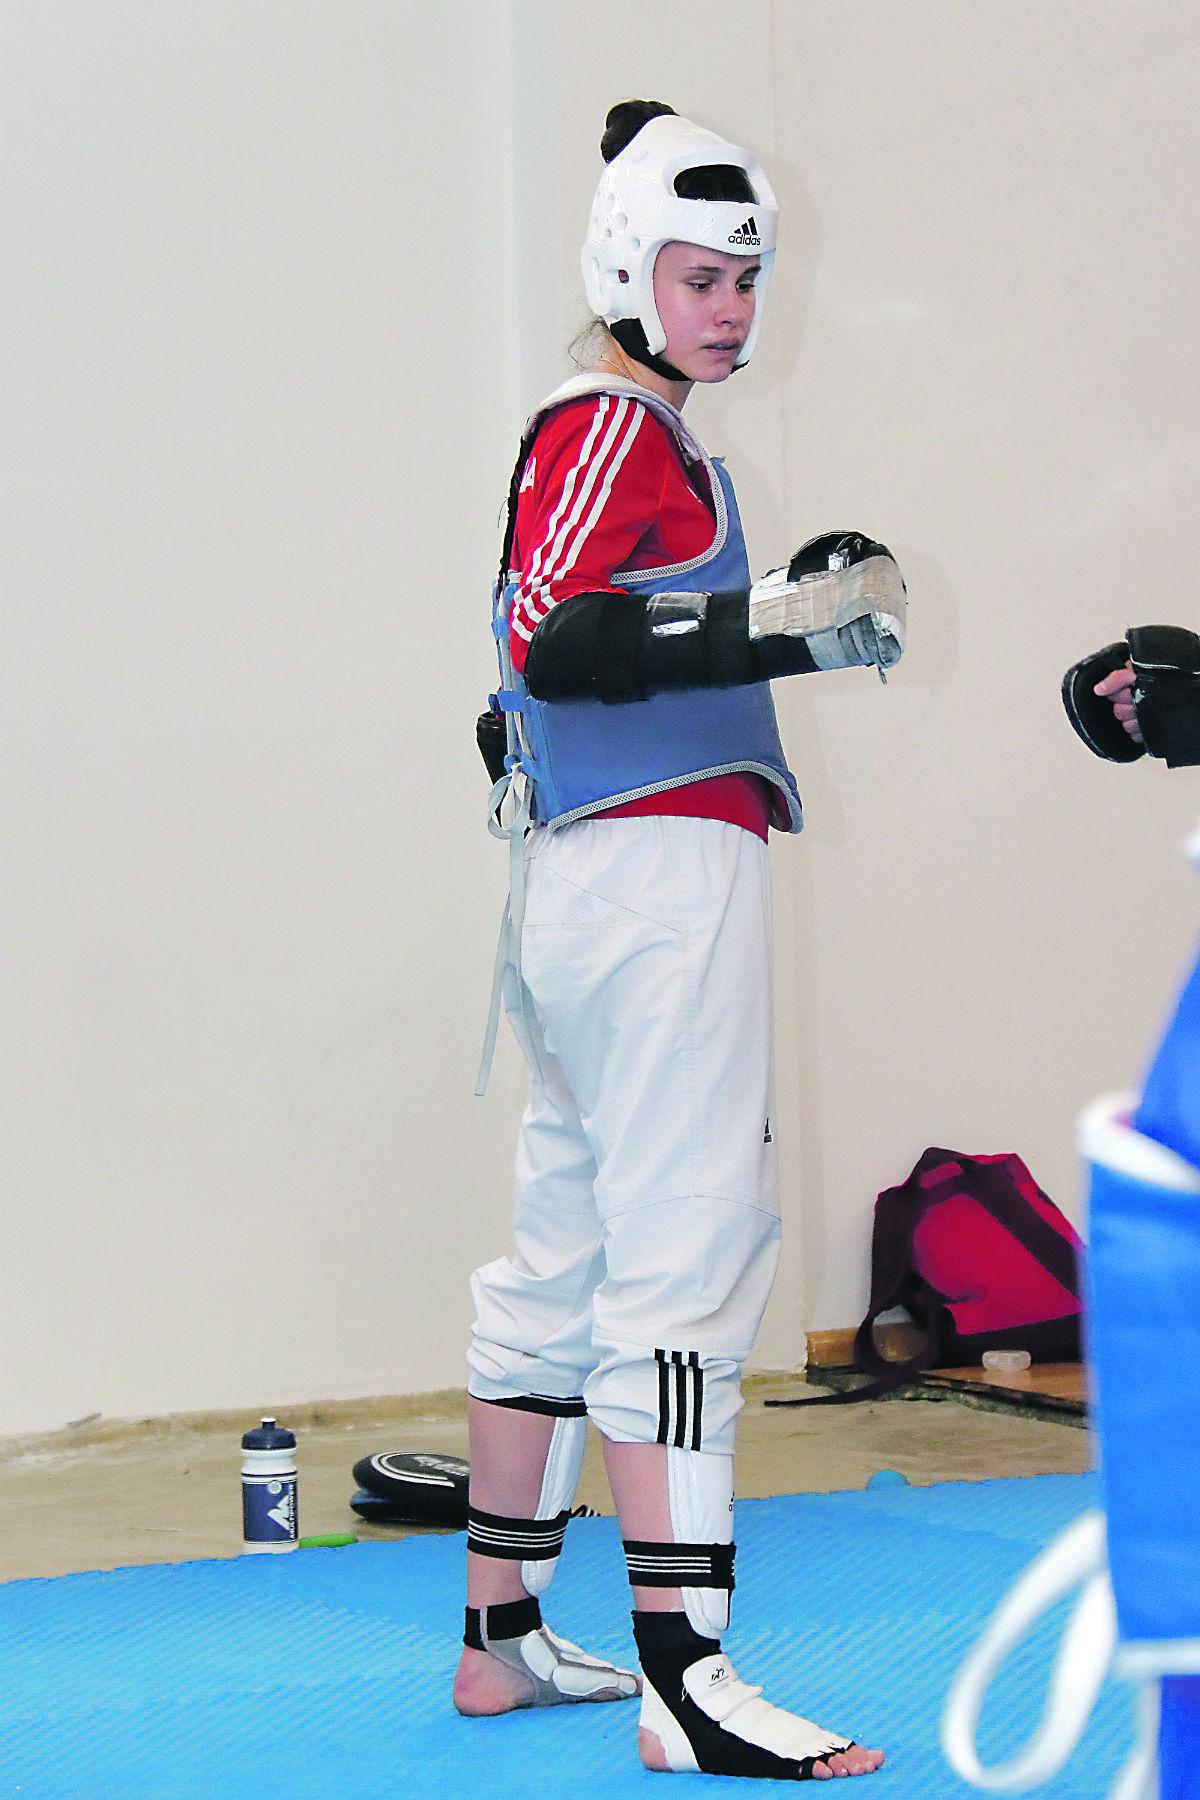 287908-149194-taekwondo7-030518_copy-1_1